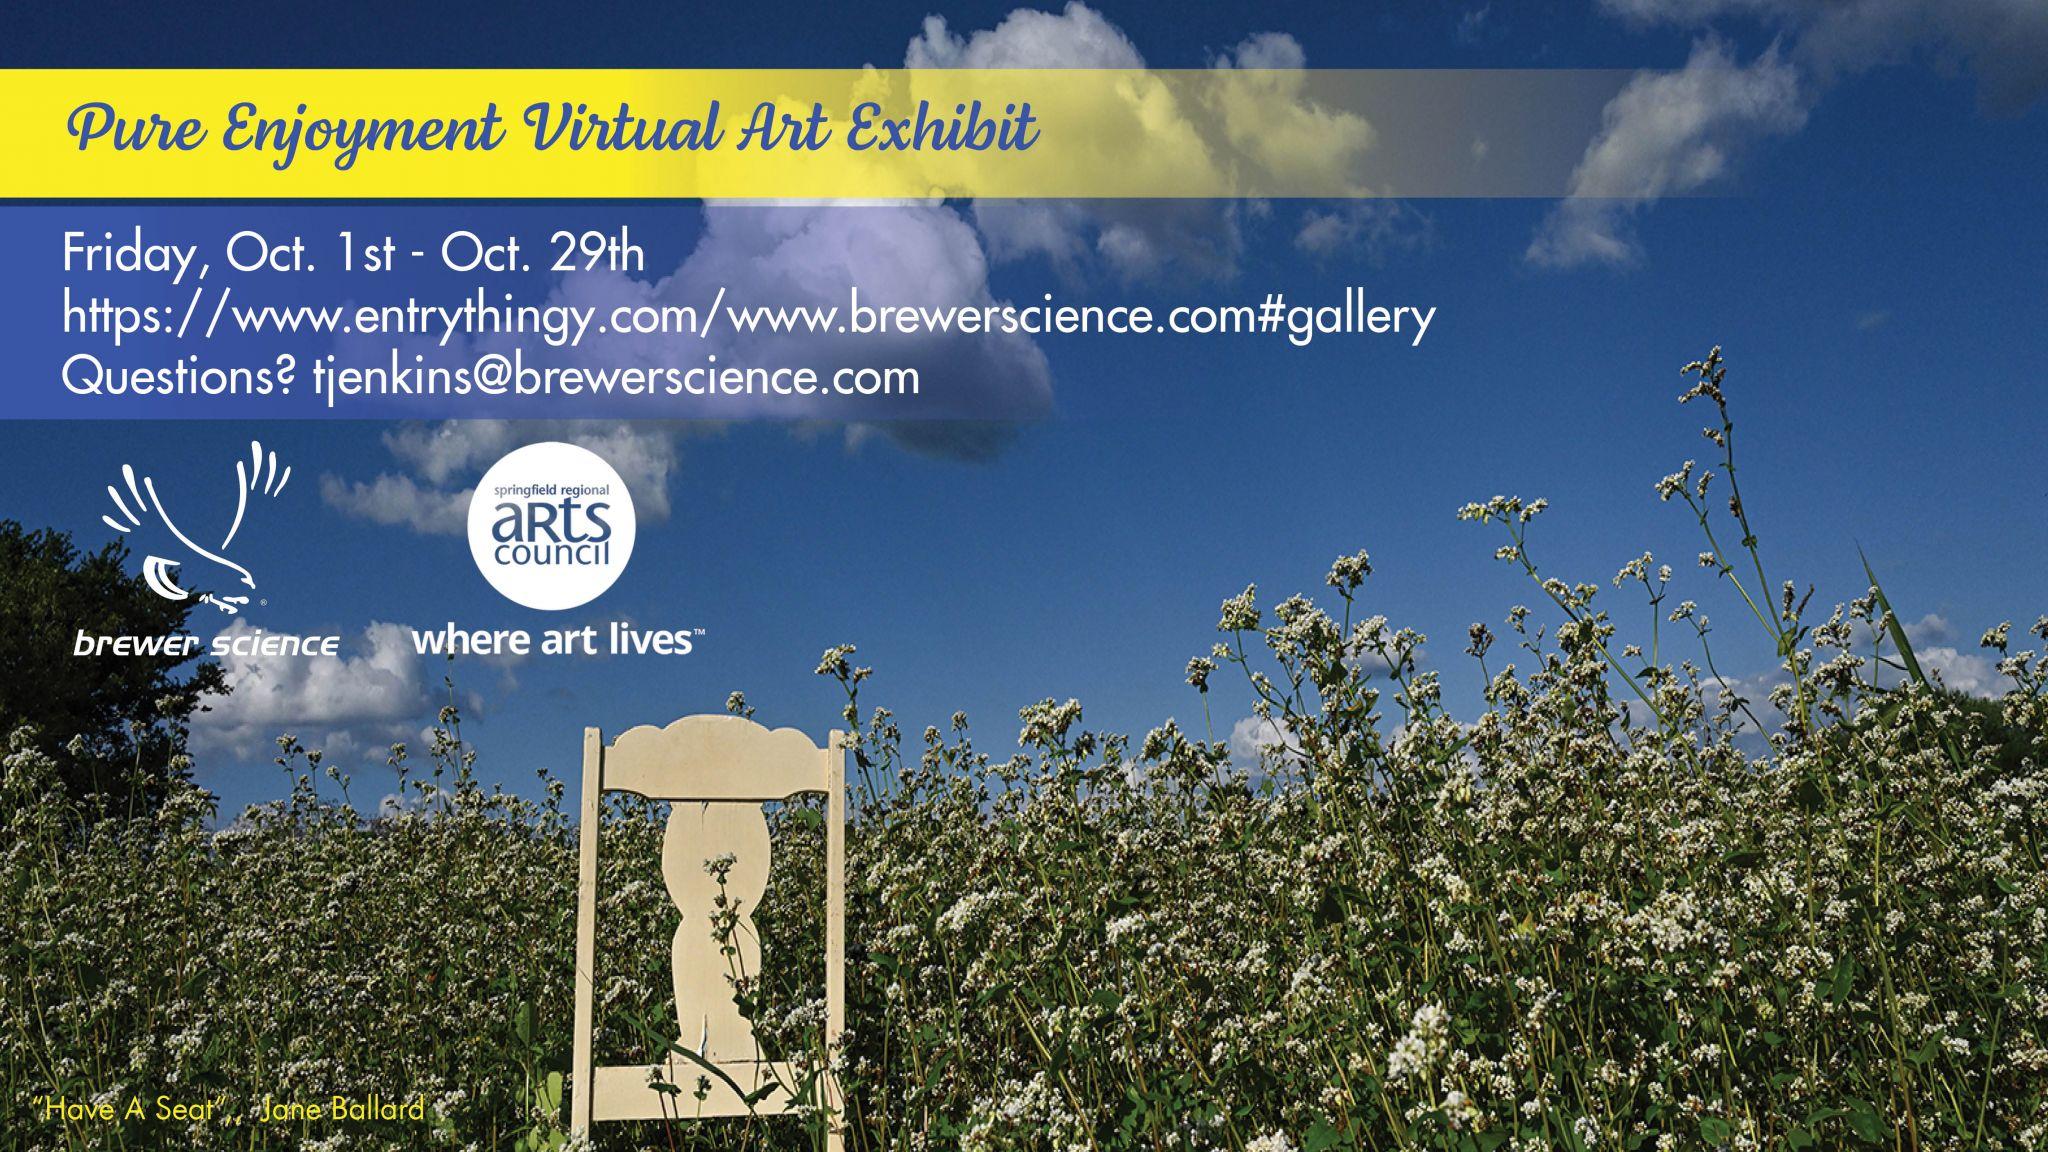 Brewer Science Pure Enjoyment Art Show 2021